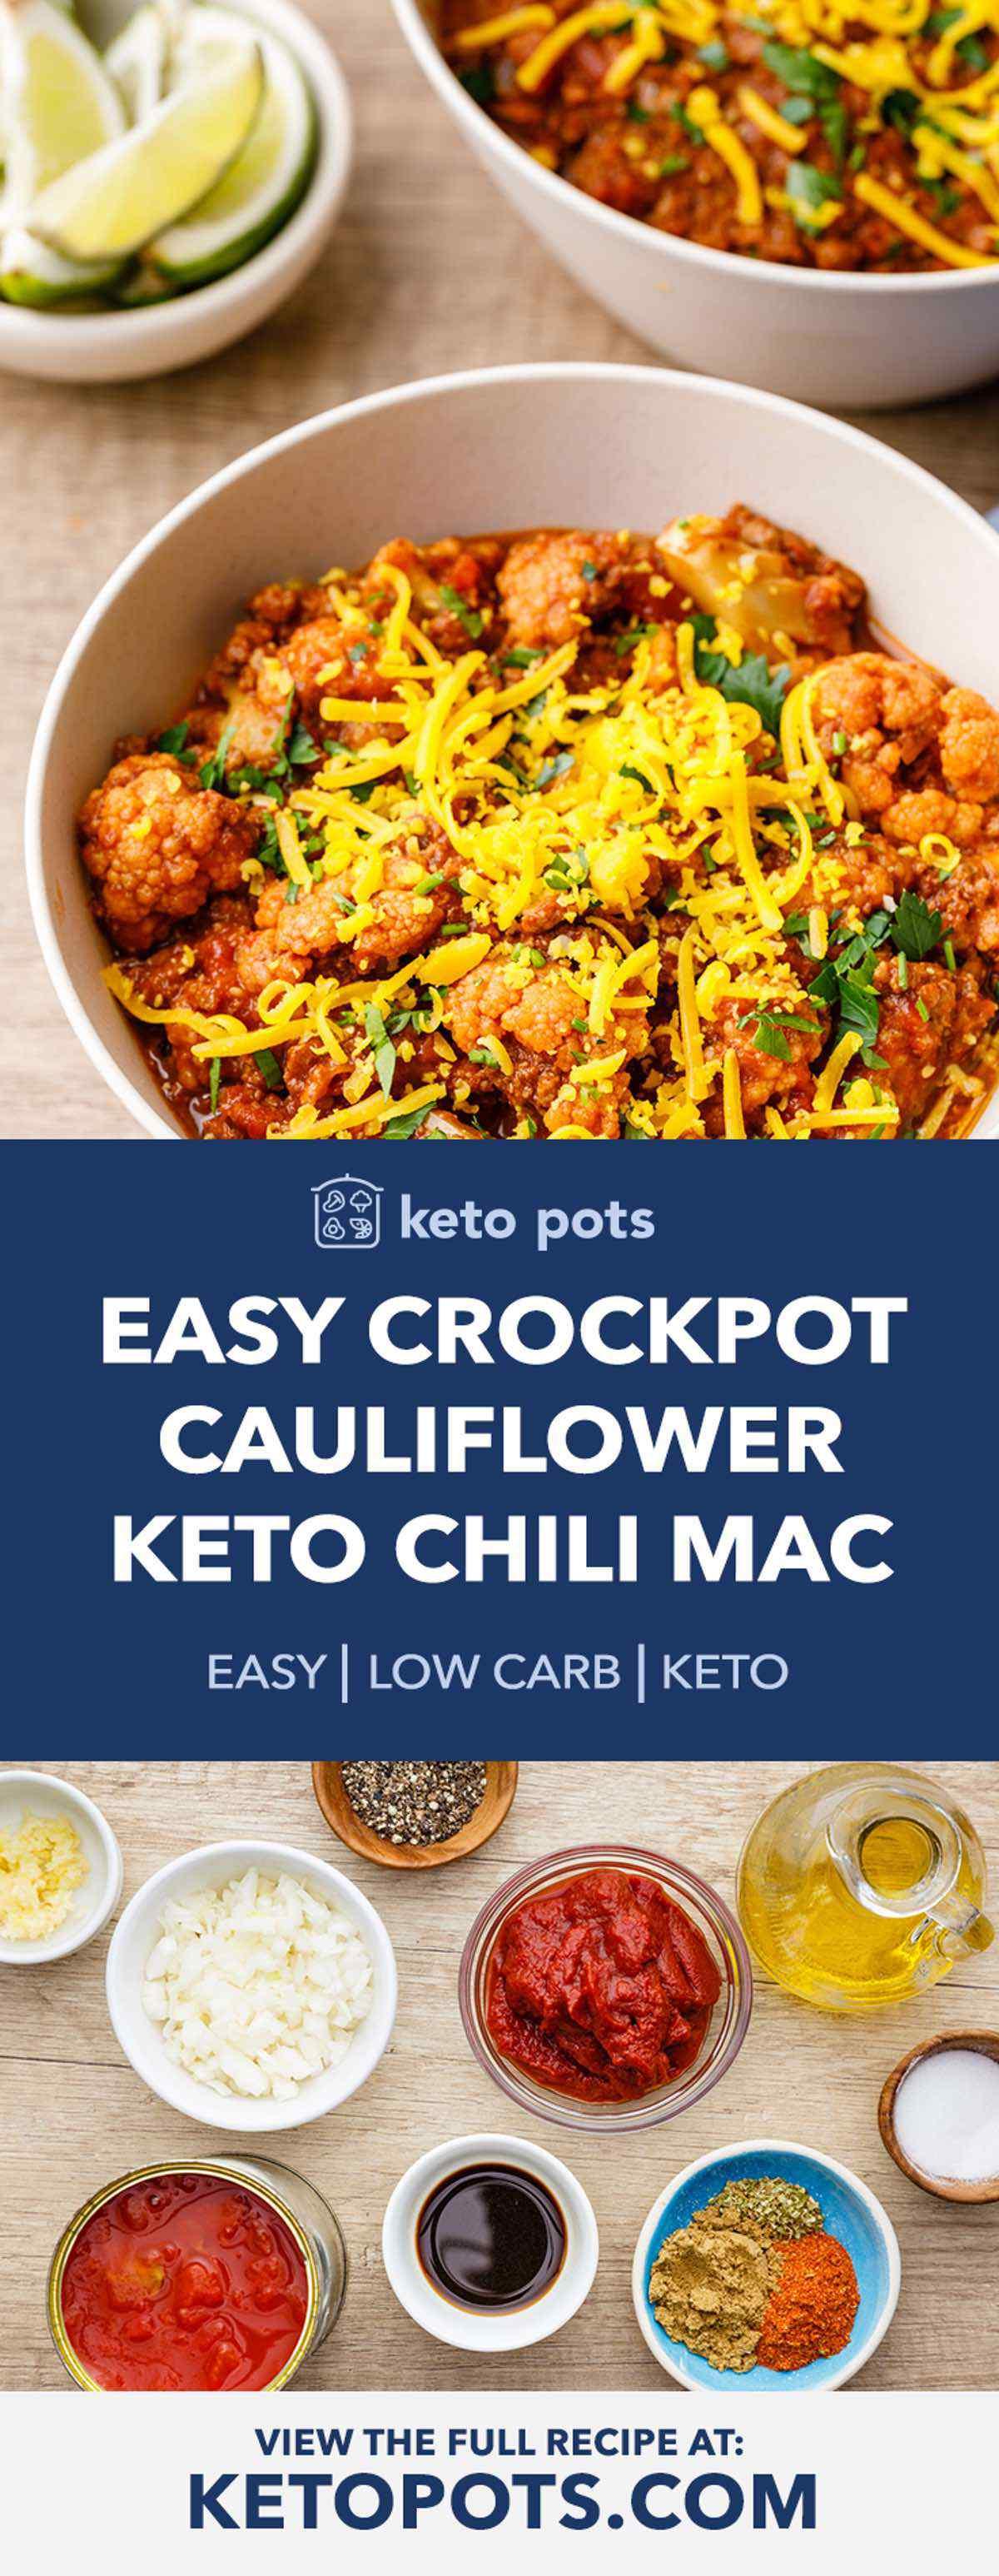 Easy Crockpot Keto Chili Mac